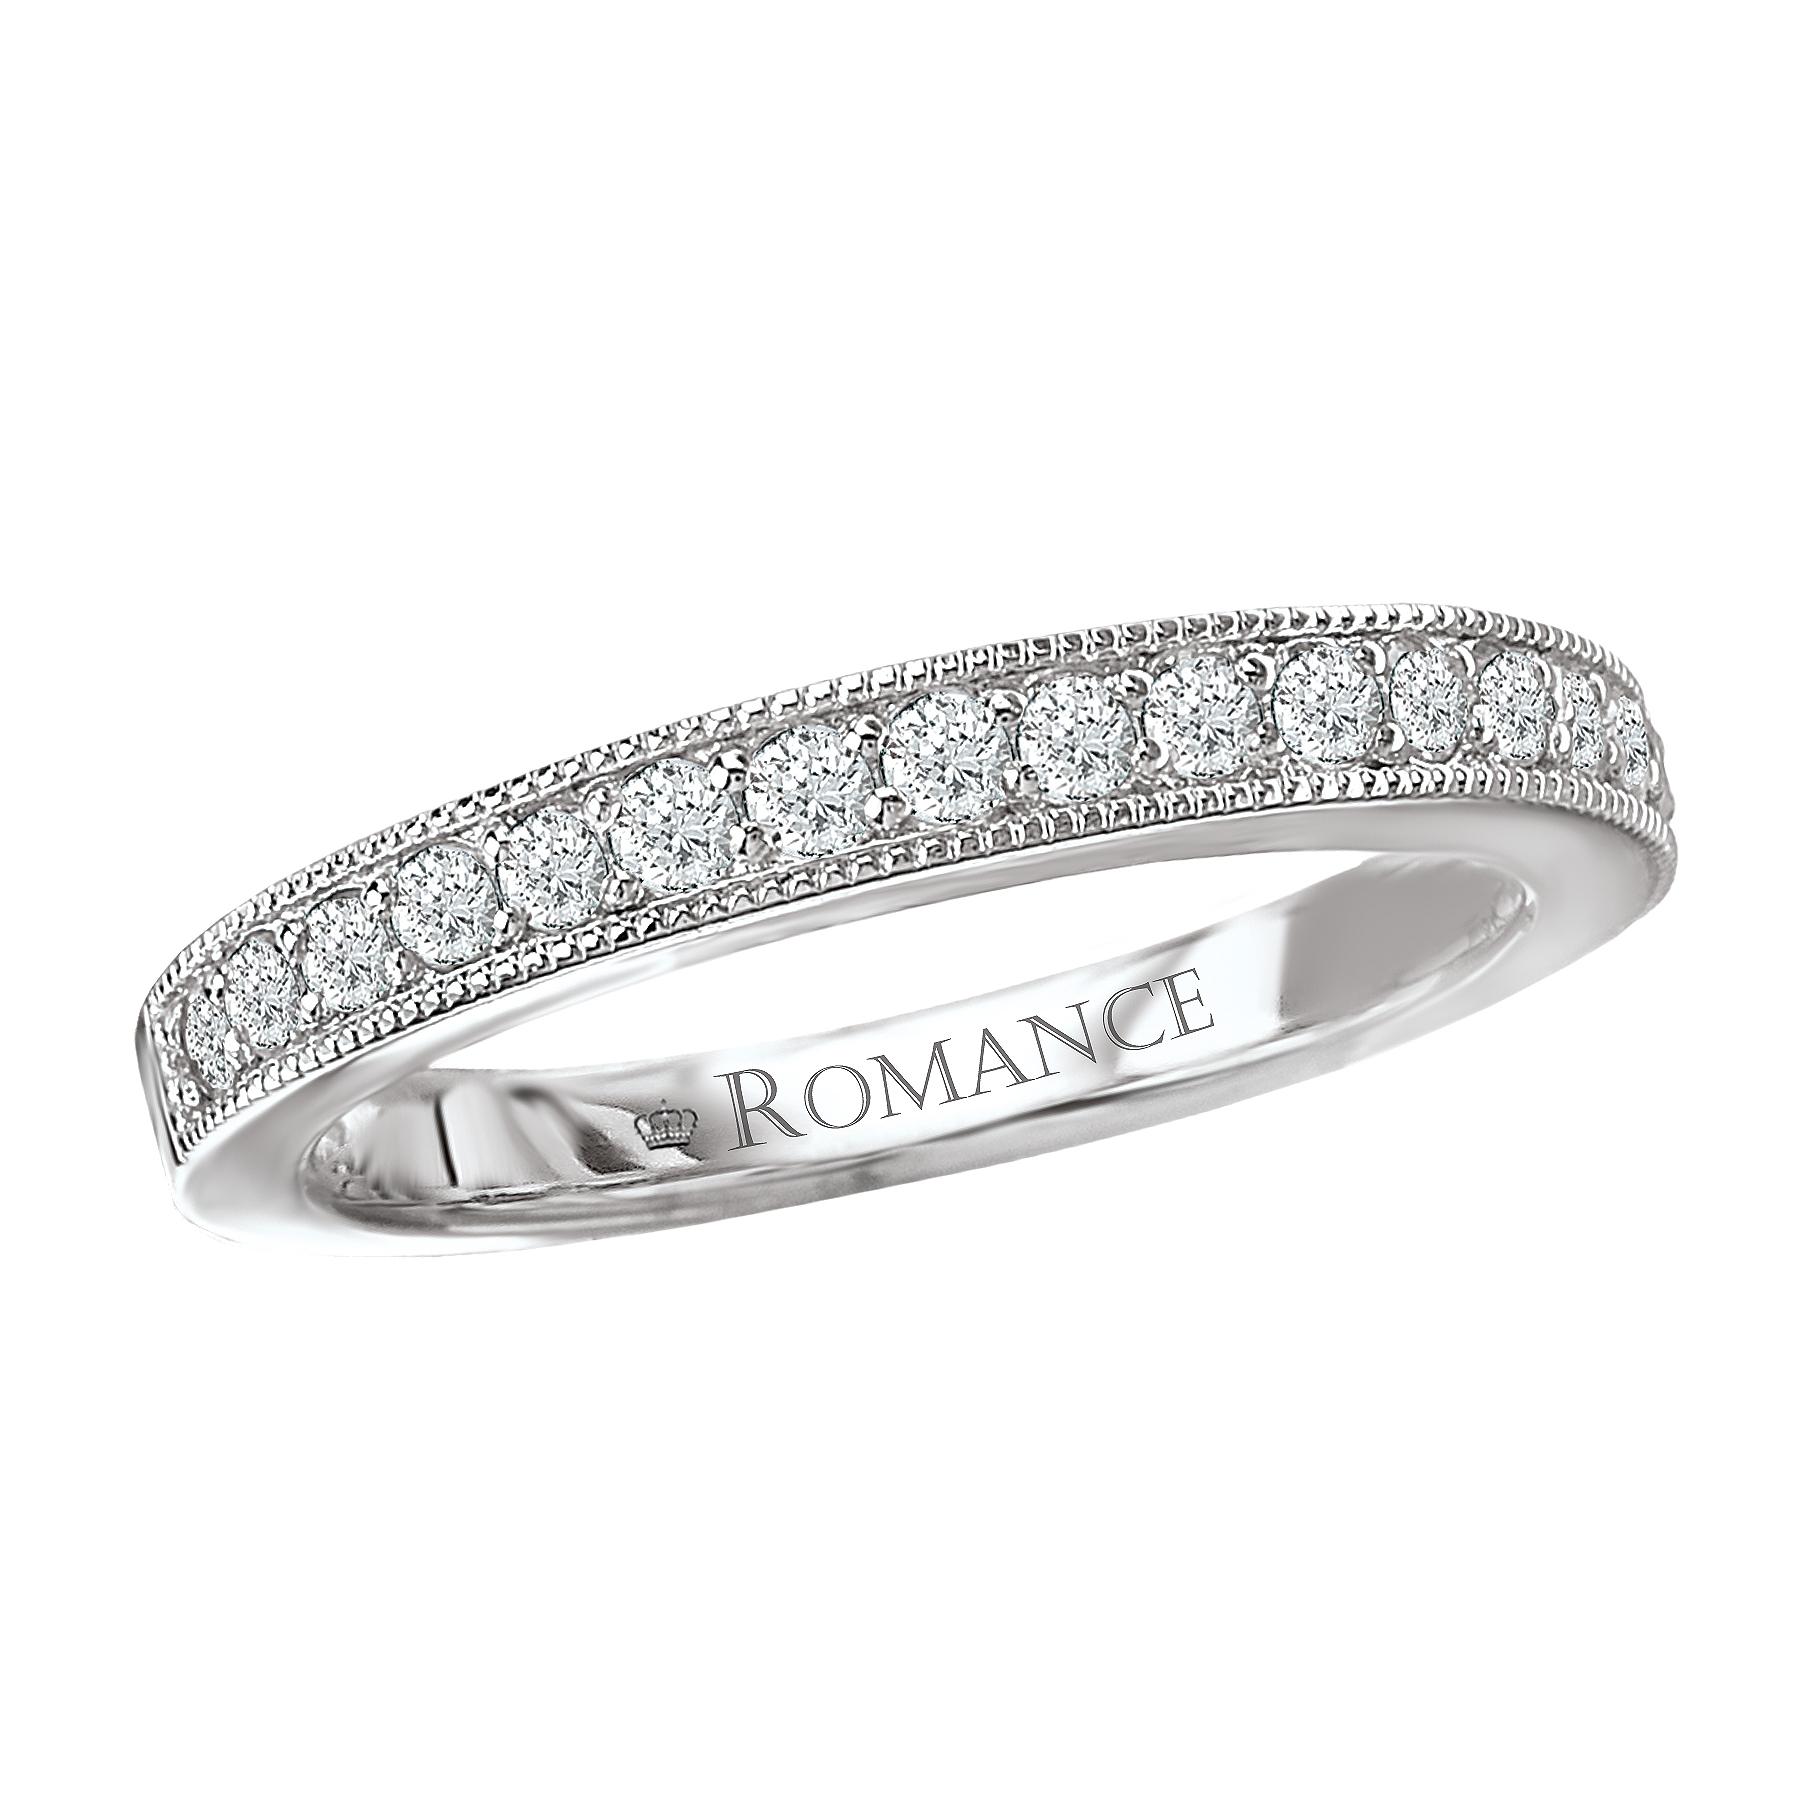 Romance Wedding Bands 117331-W product image